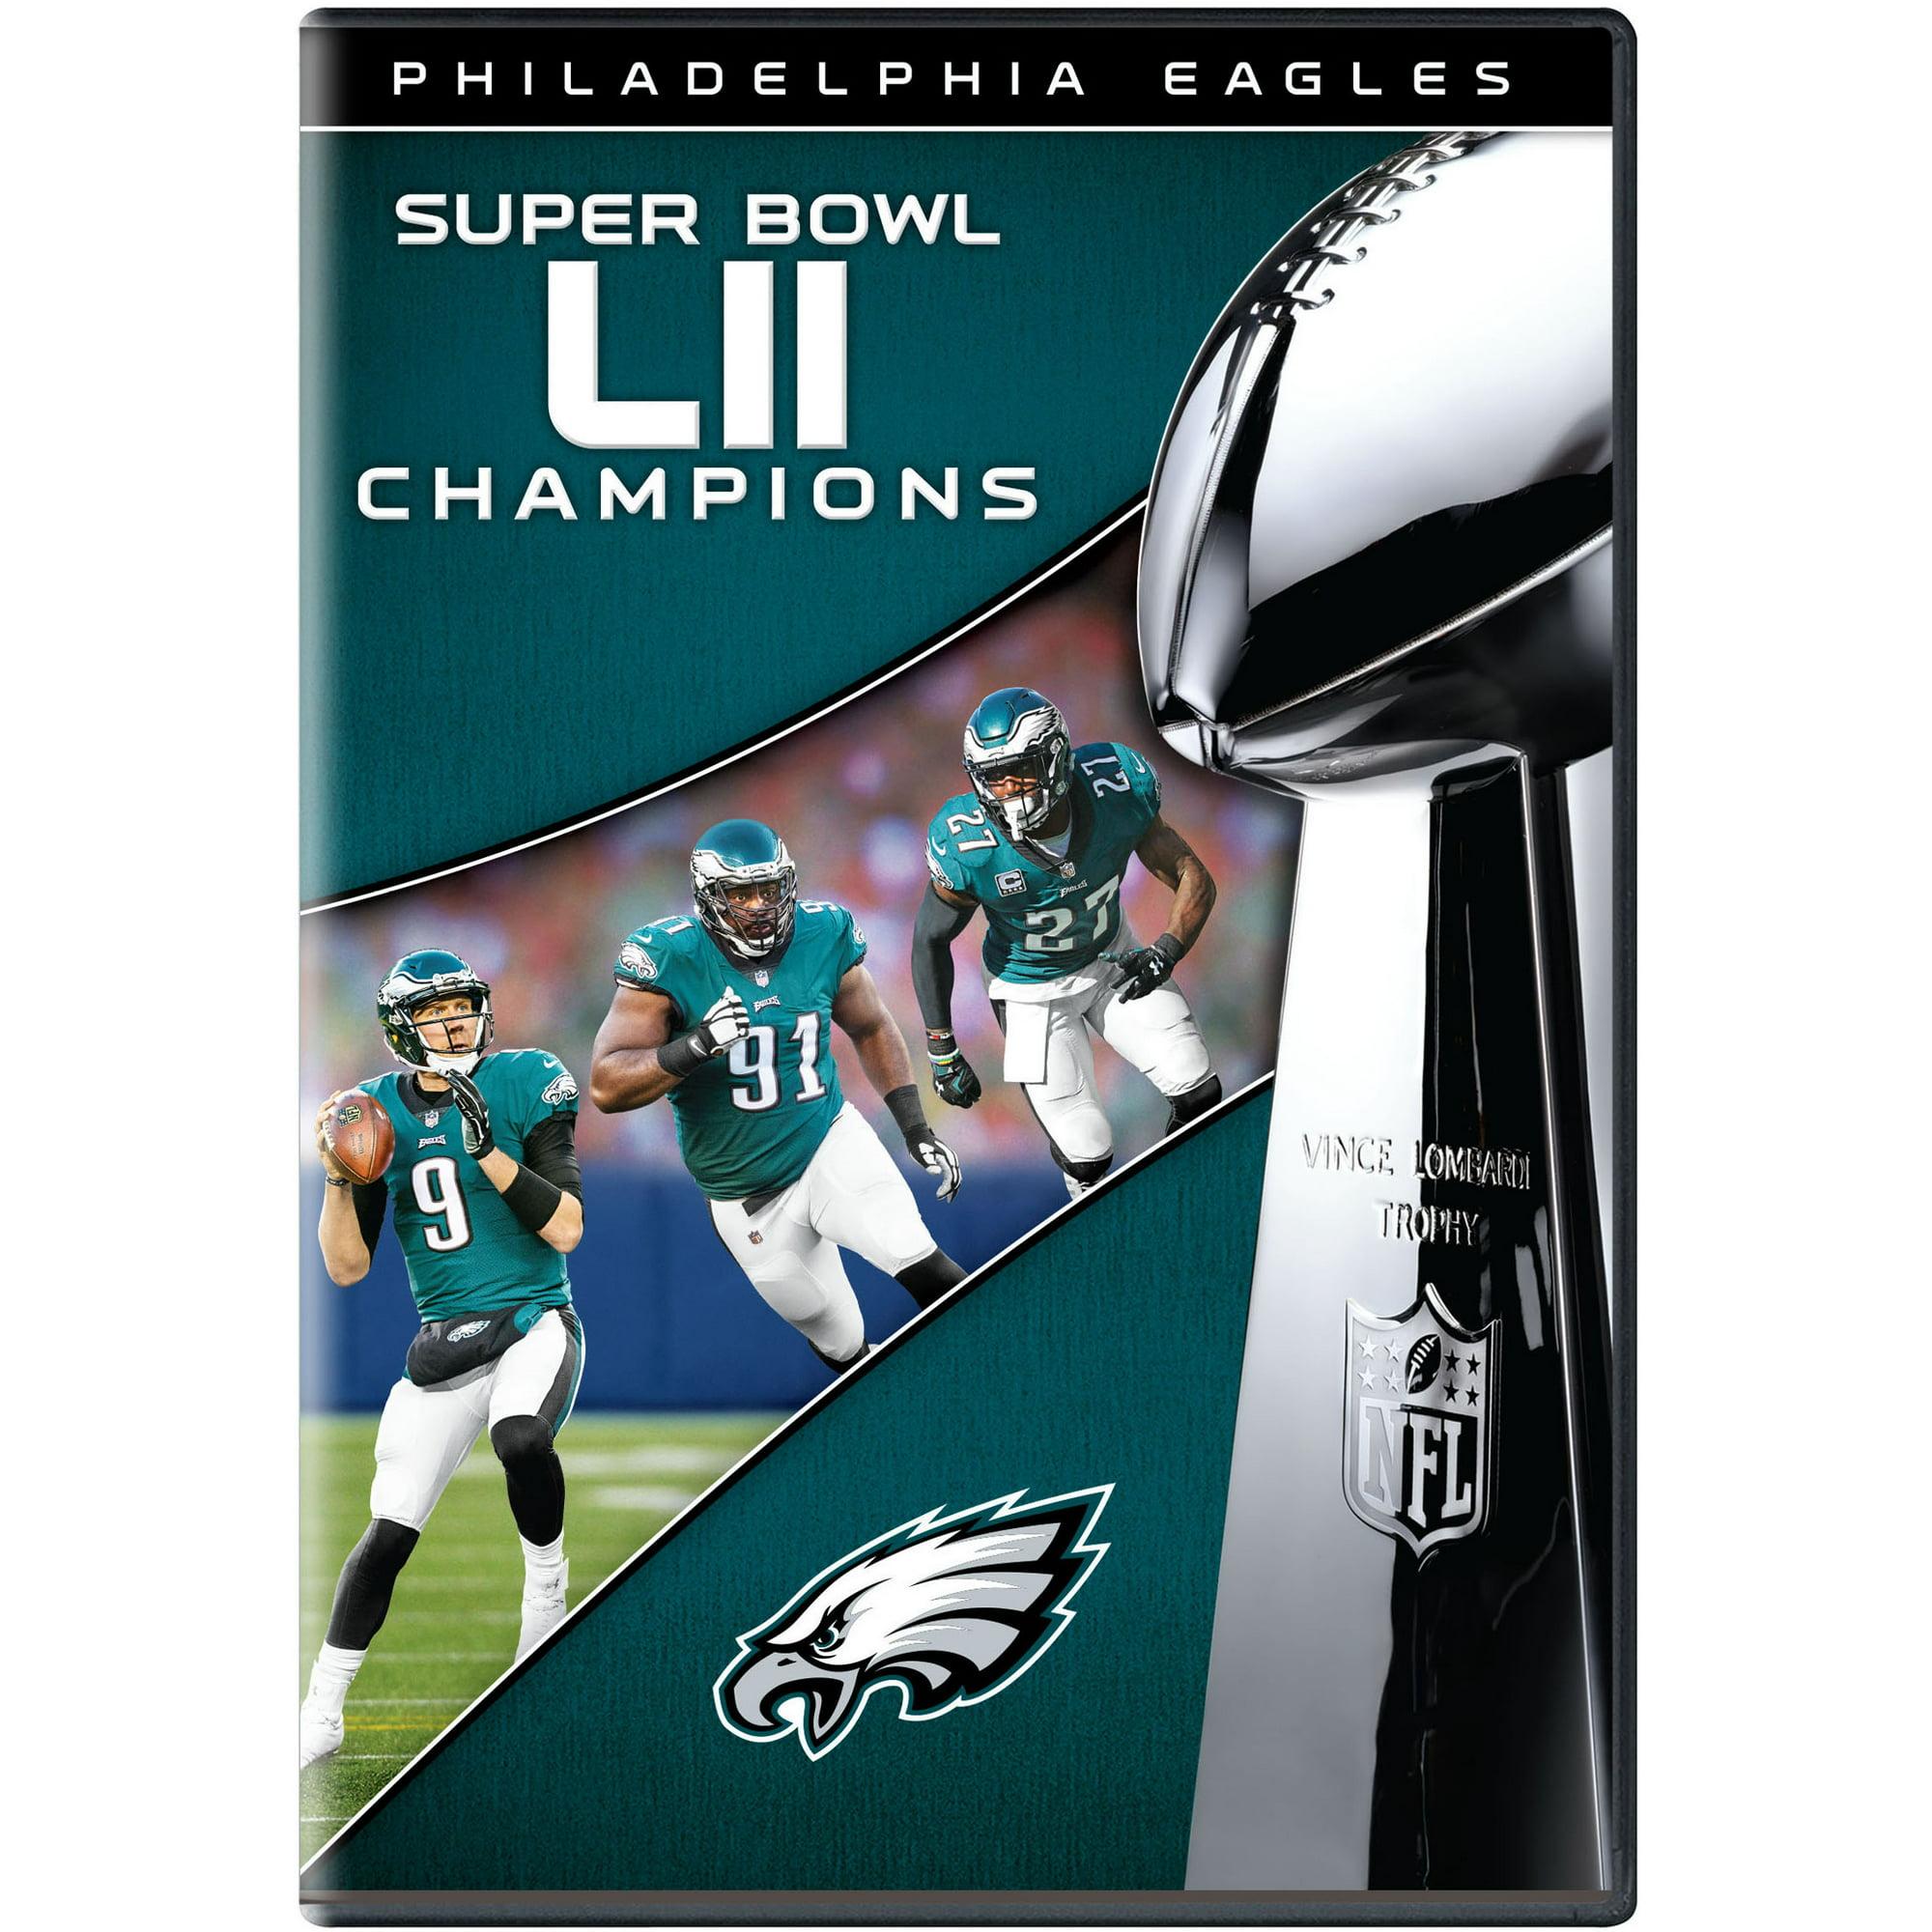 881d8e9d9 Buy Philadelphia Eagles NFL Super Bowl 52 Champions (DVD)